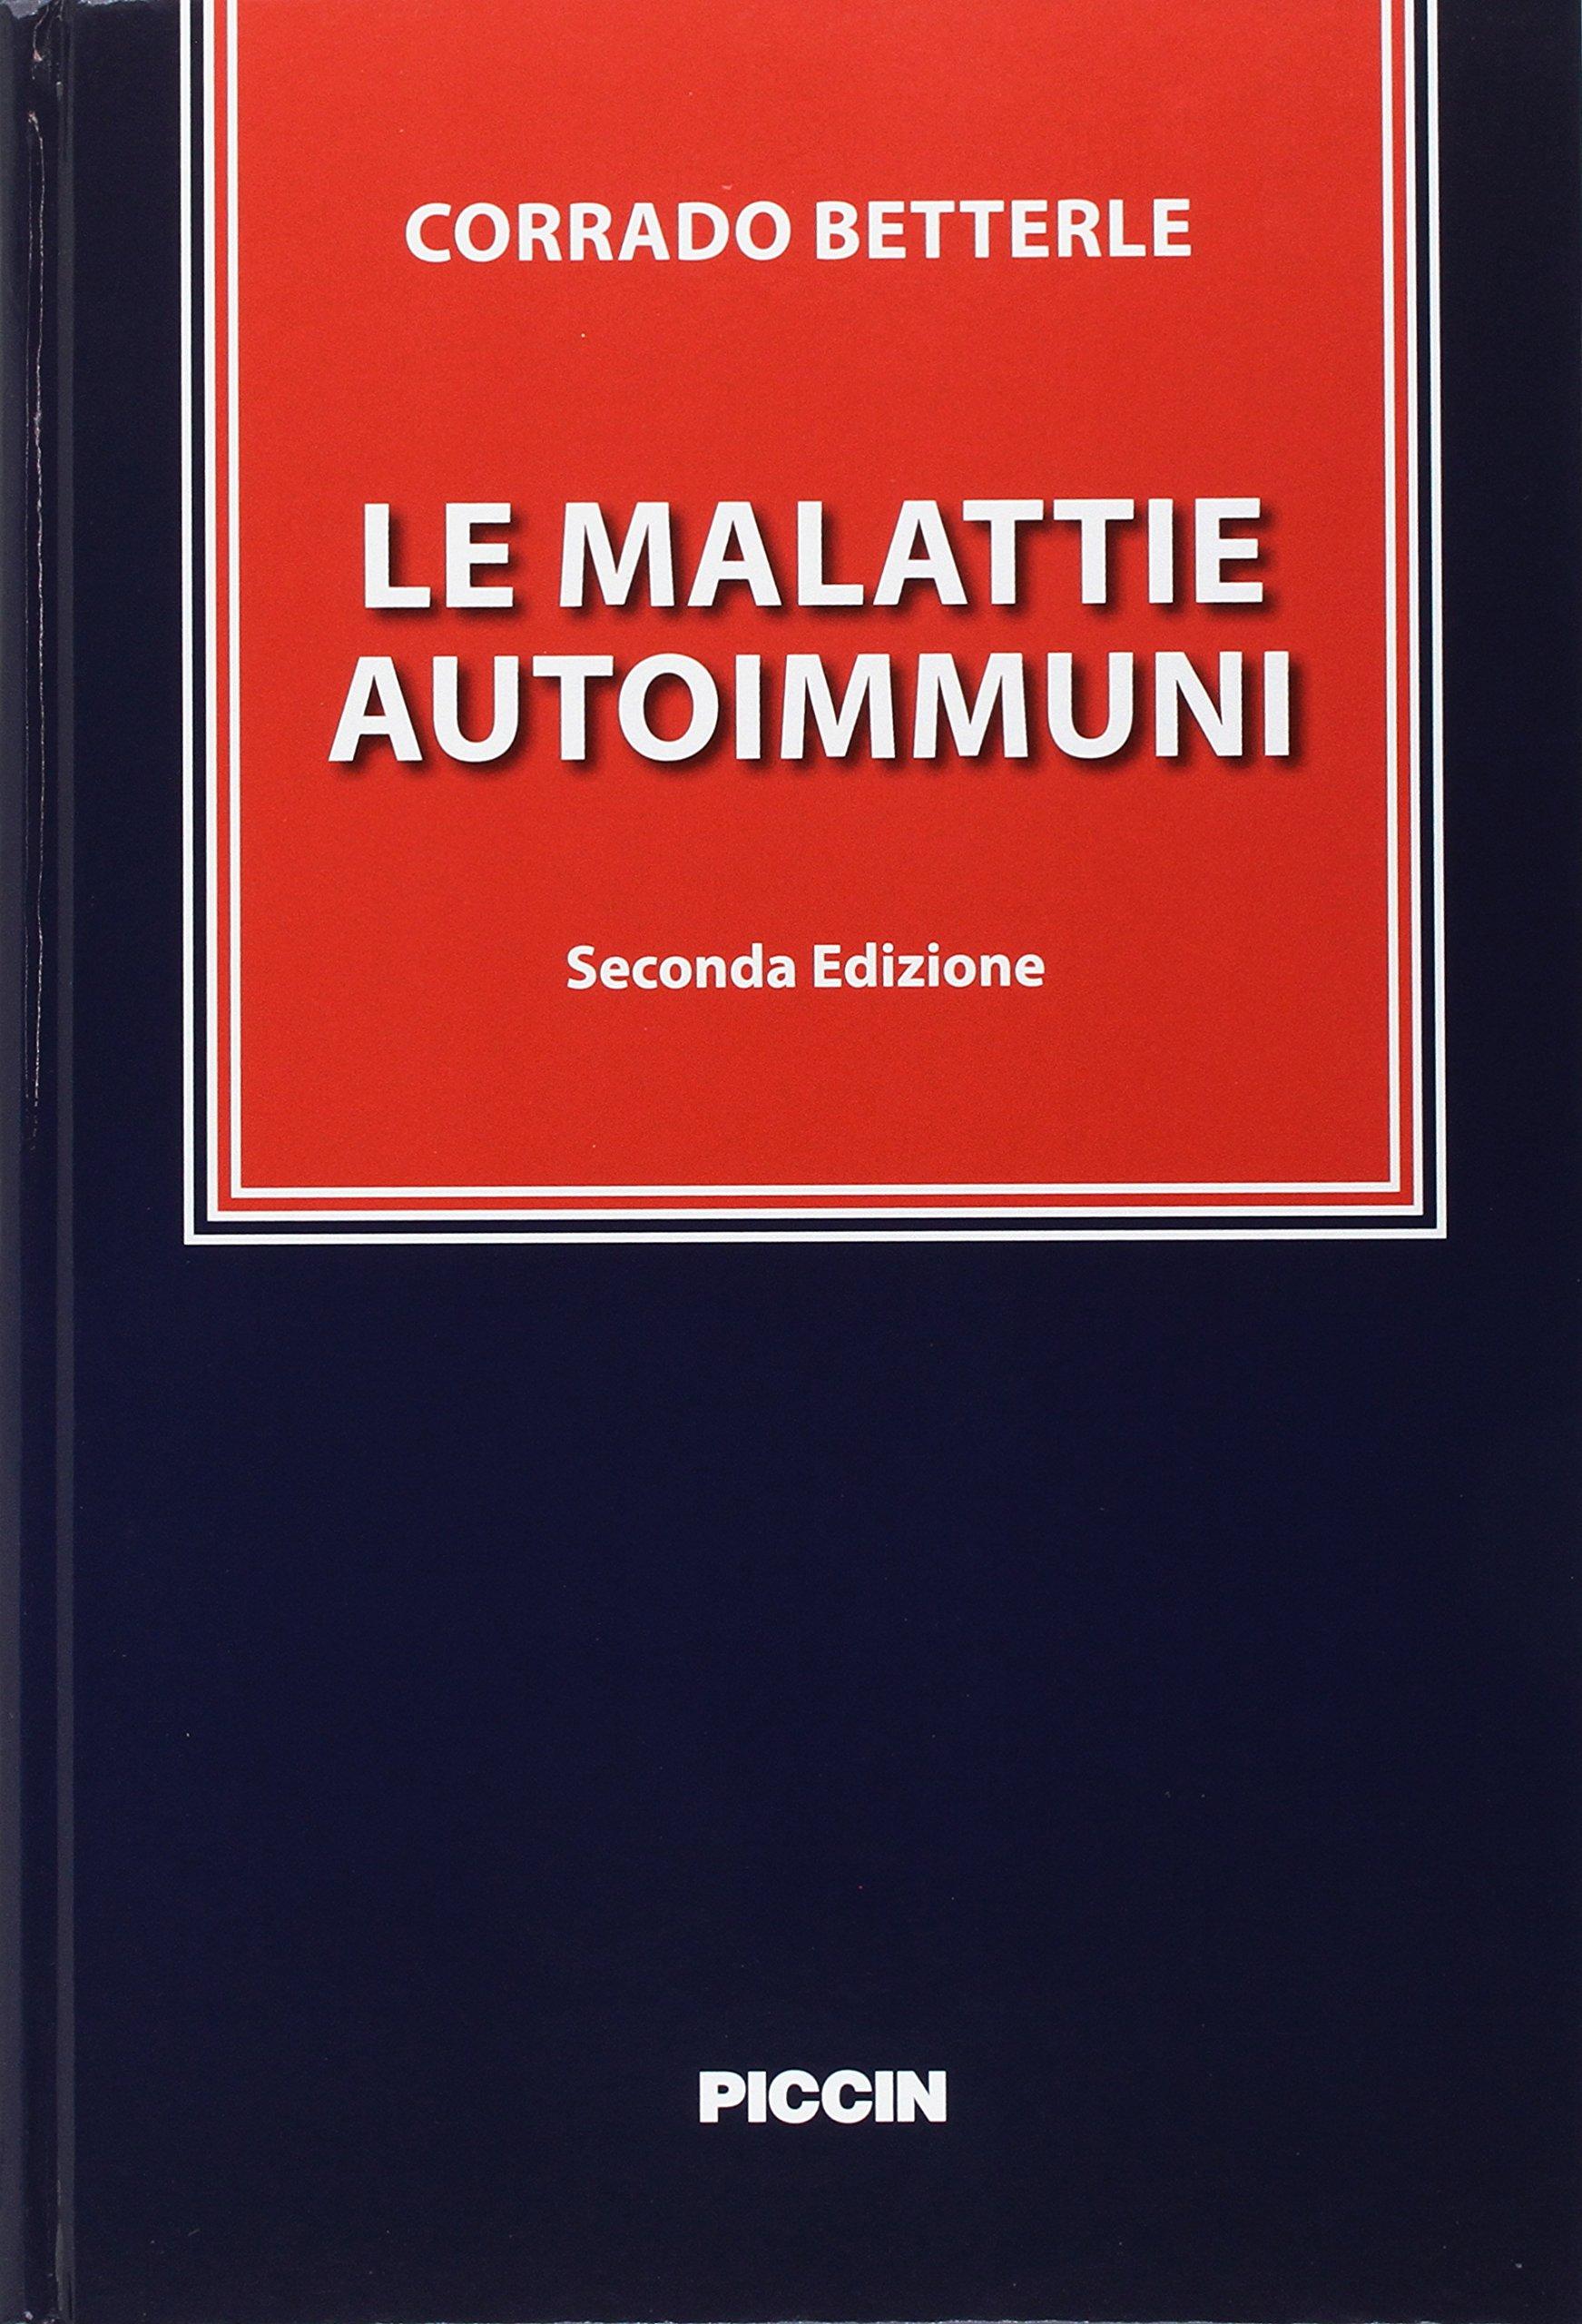 Le malattie autoimmuni: Amazon it: Corrado Betterle: Libri